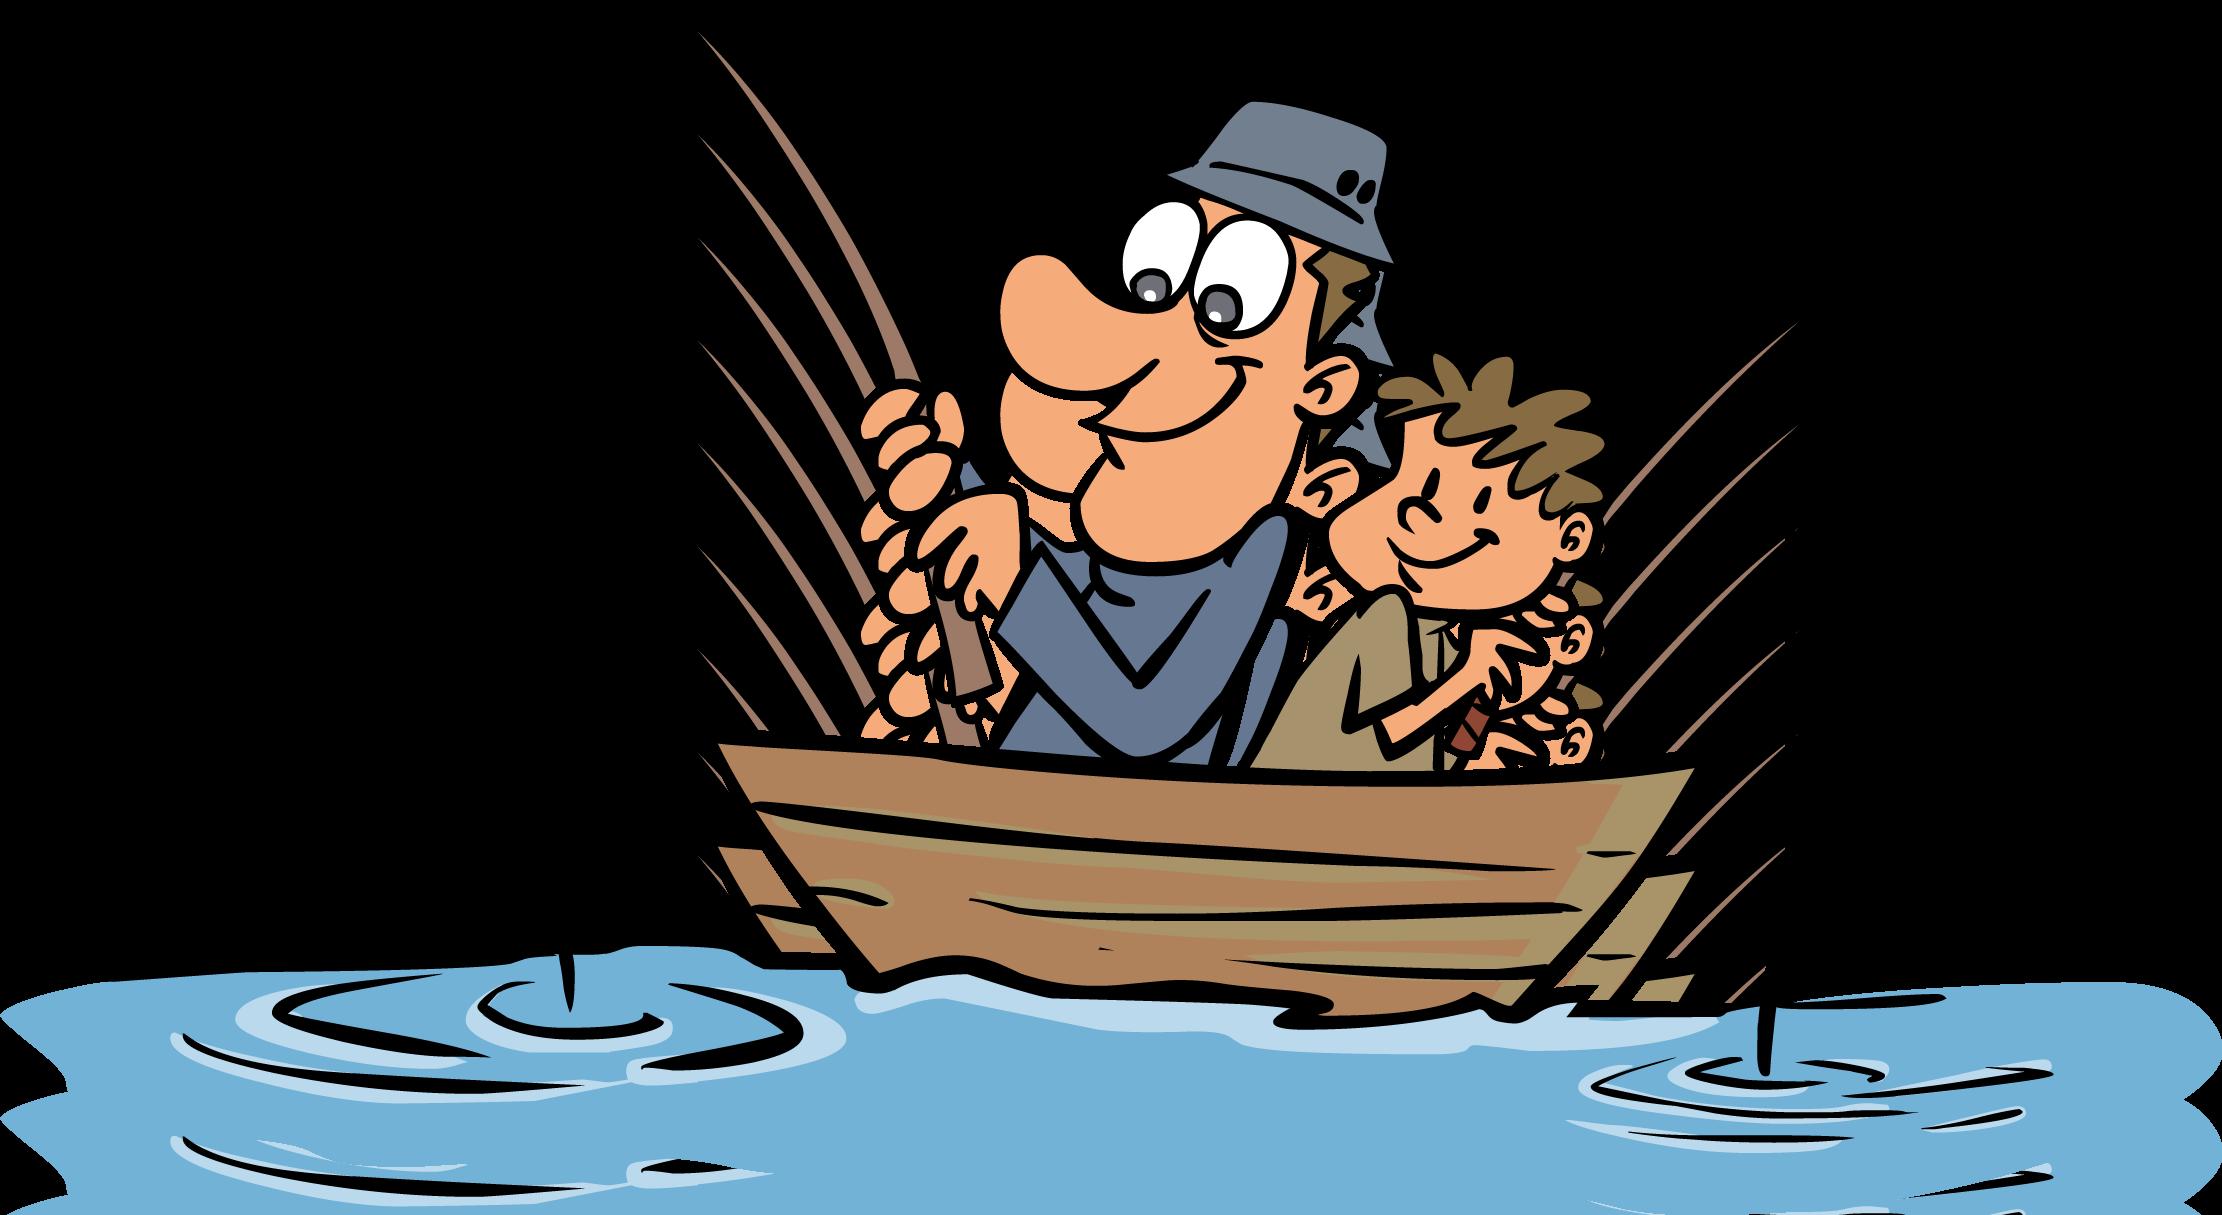 Clipart lake habitat pond. Fishing cartoon png humor